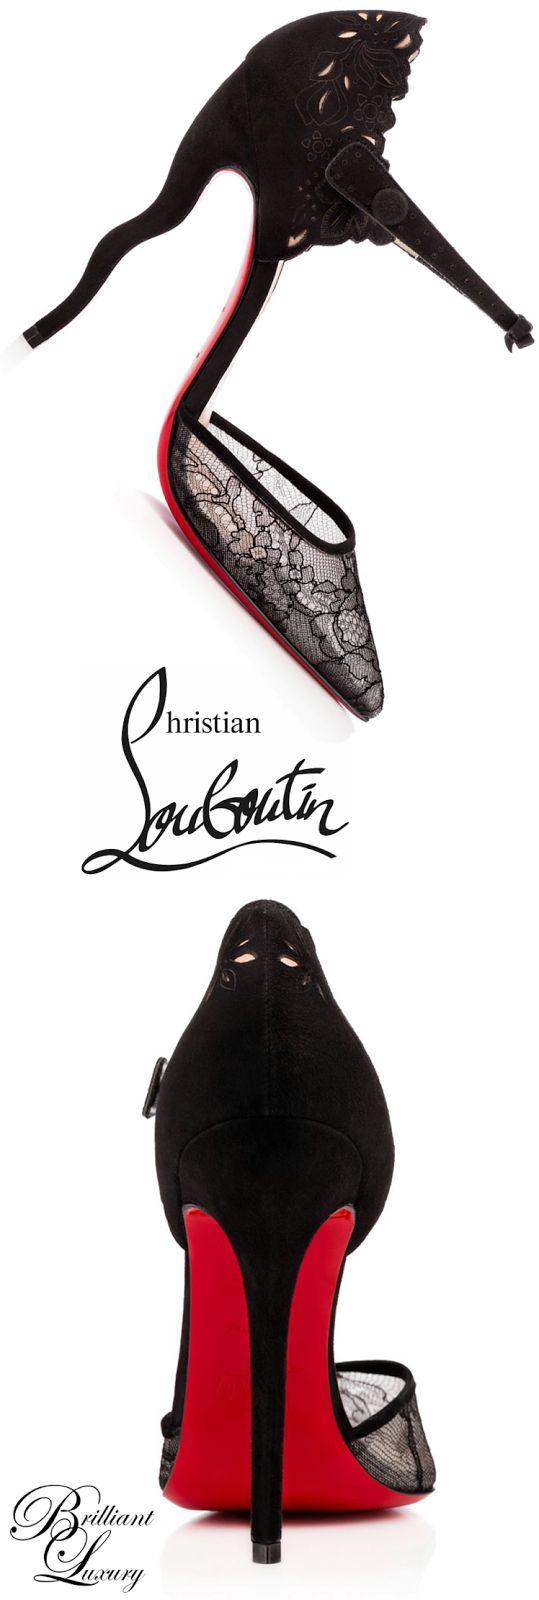 Brilliant Luxury * Christian Louboutin 'Magicadiva' 2015